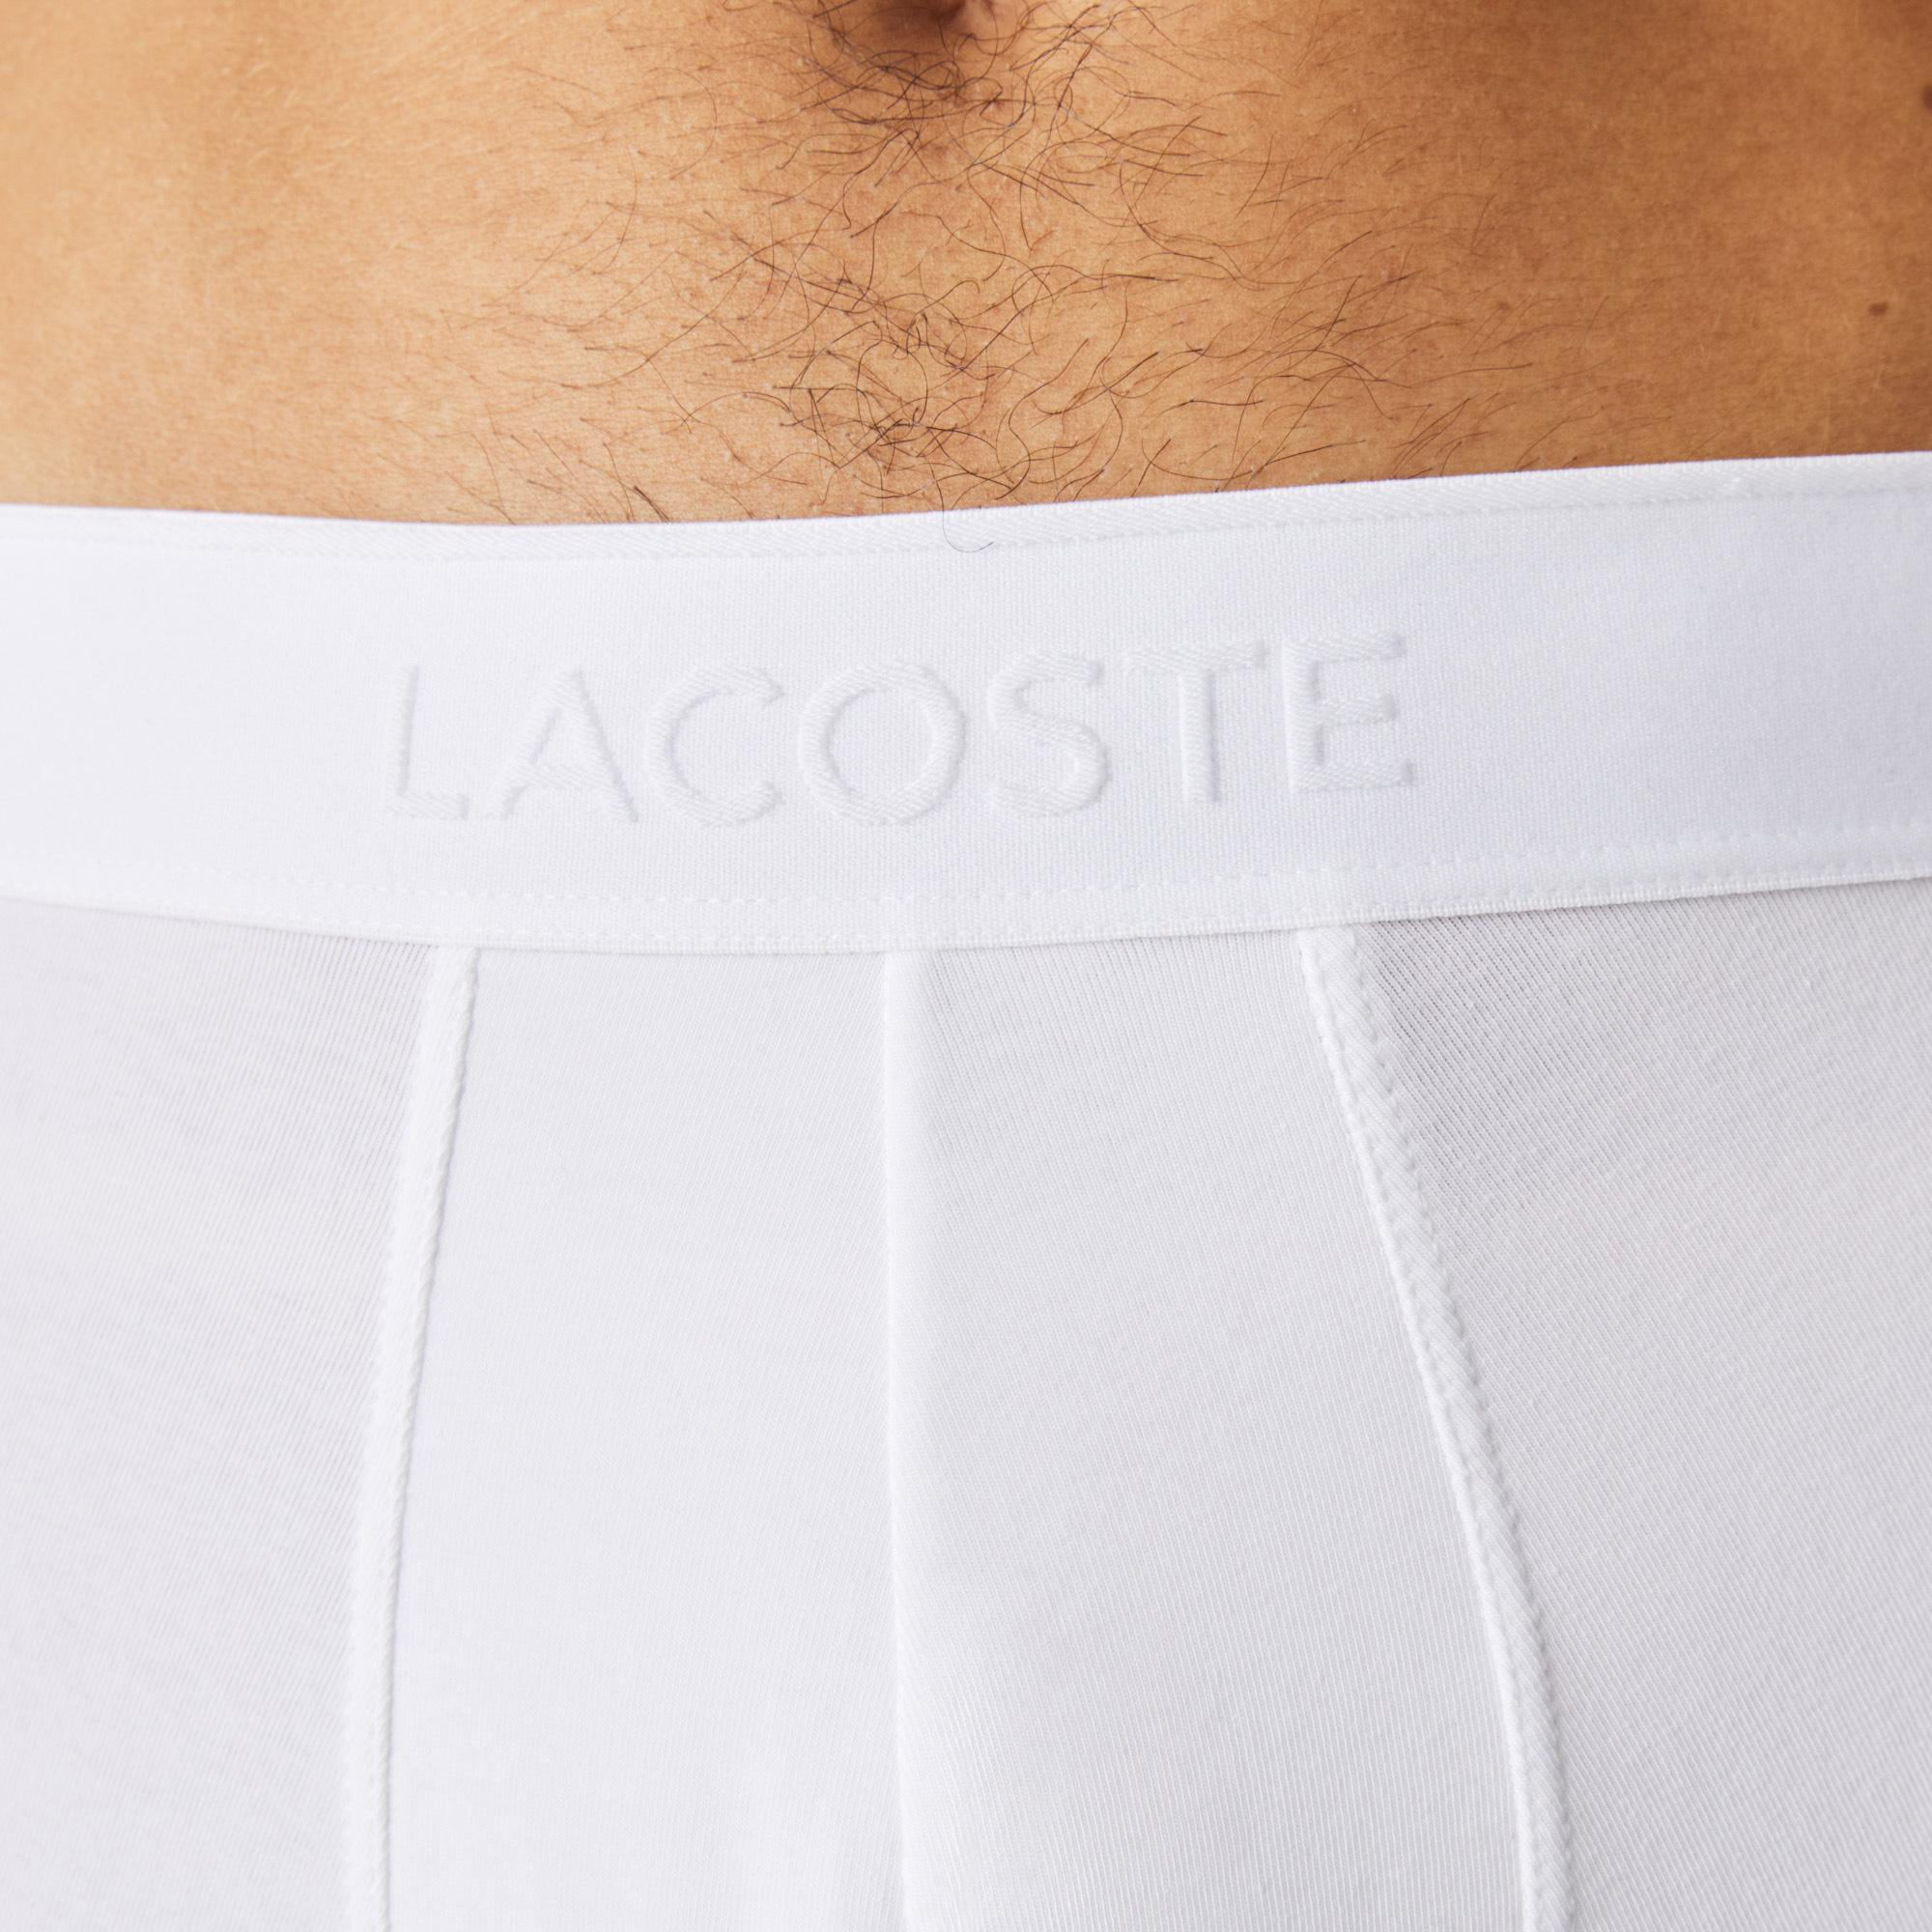 Lacoste x Polaroid Men's Stretch Cotton Trunk